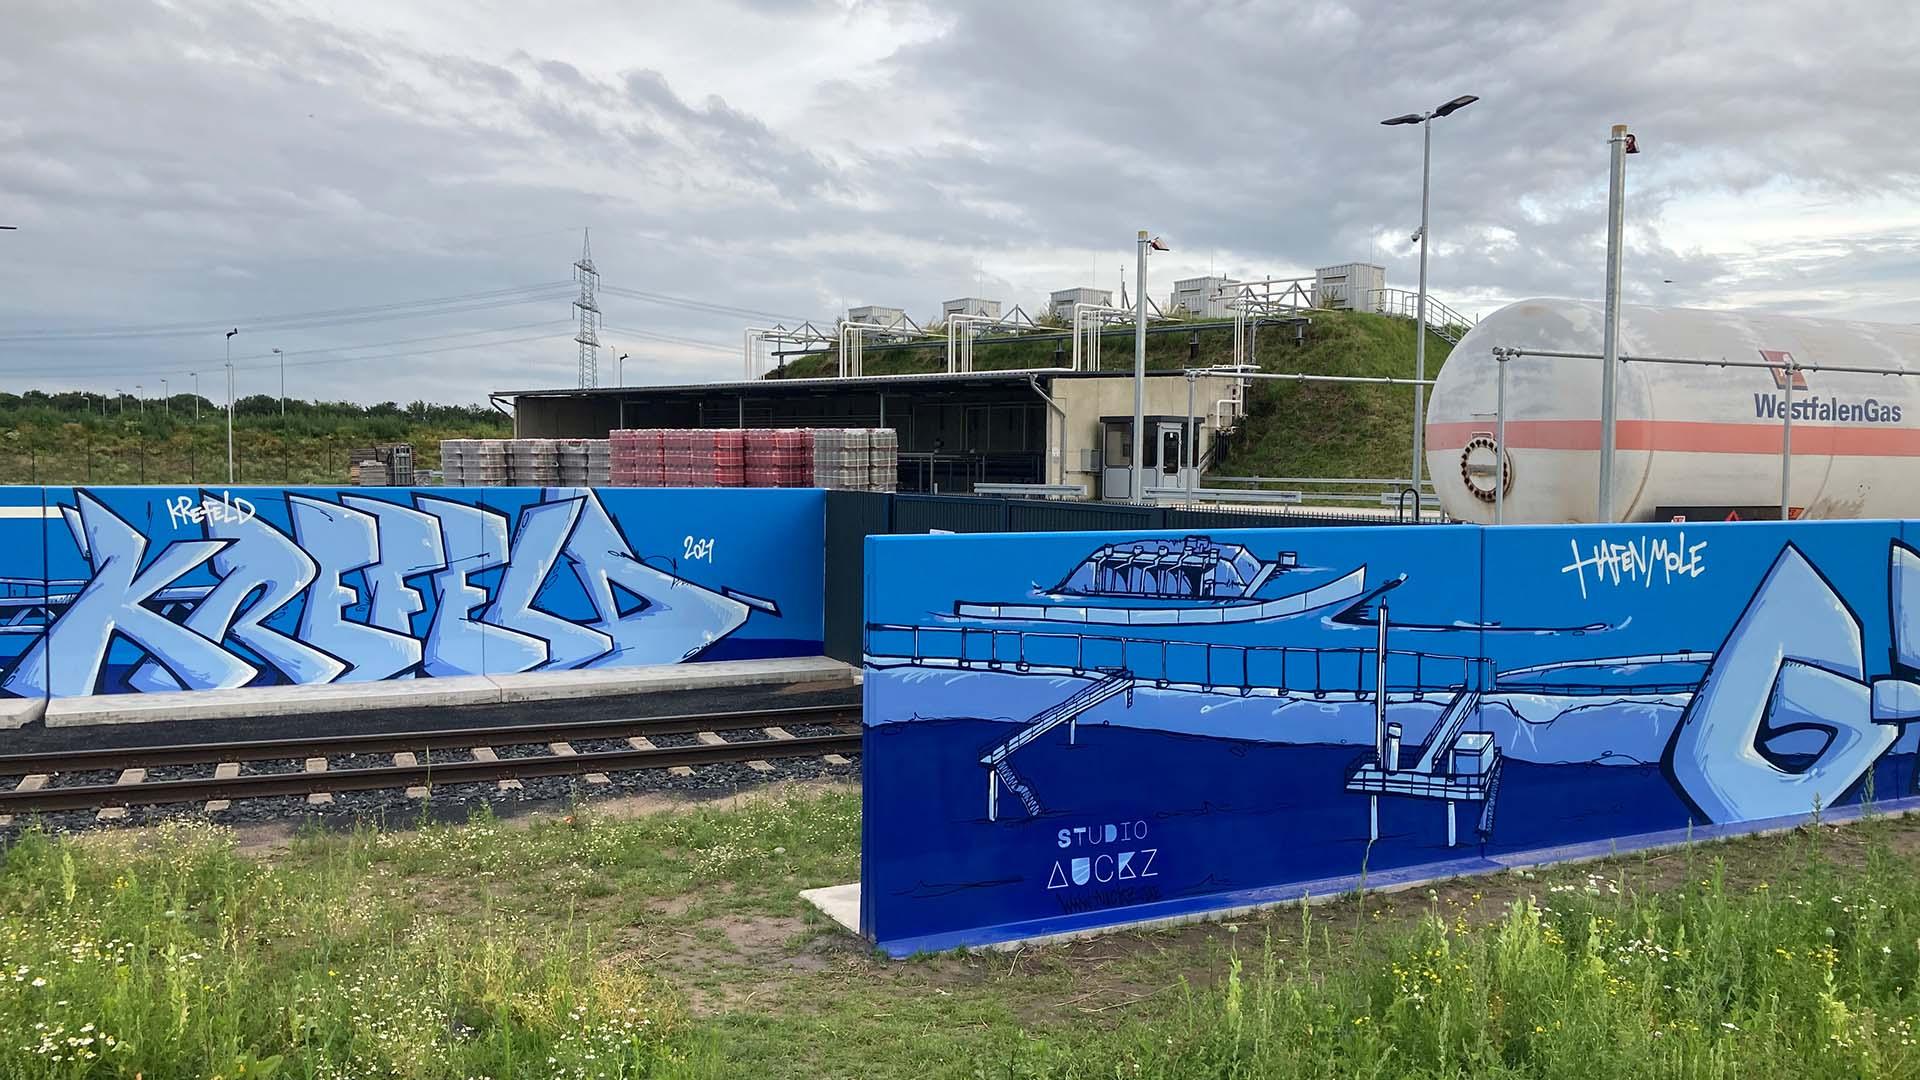 Gaswerk, Graffiti, Caratgas, Unternehmen, Firma, Krefeld